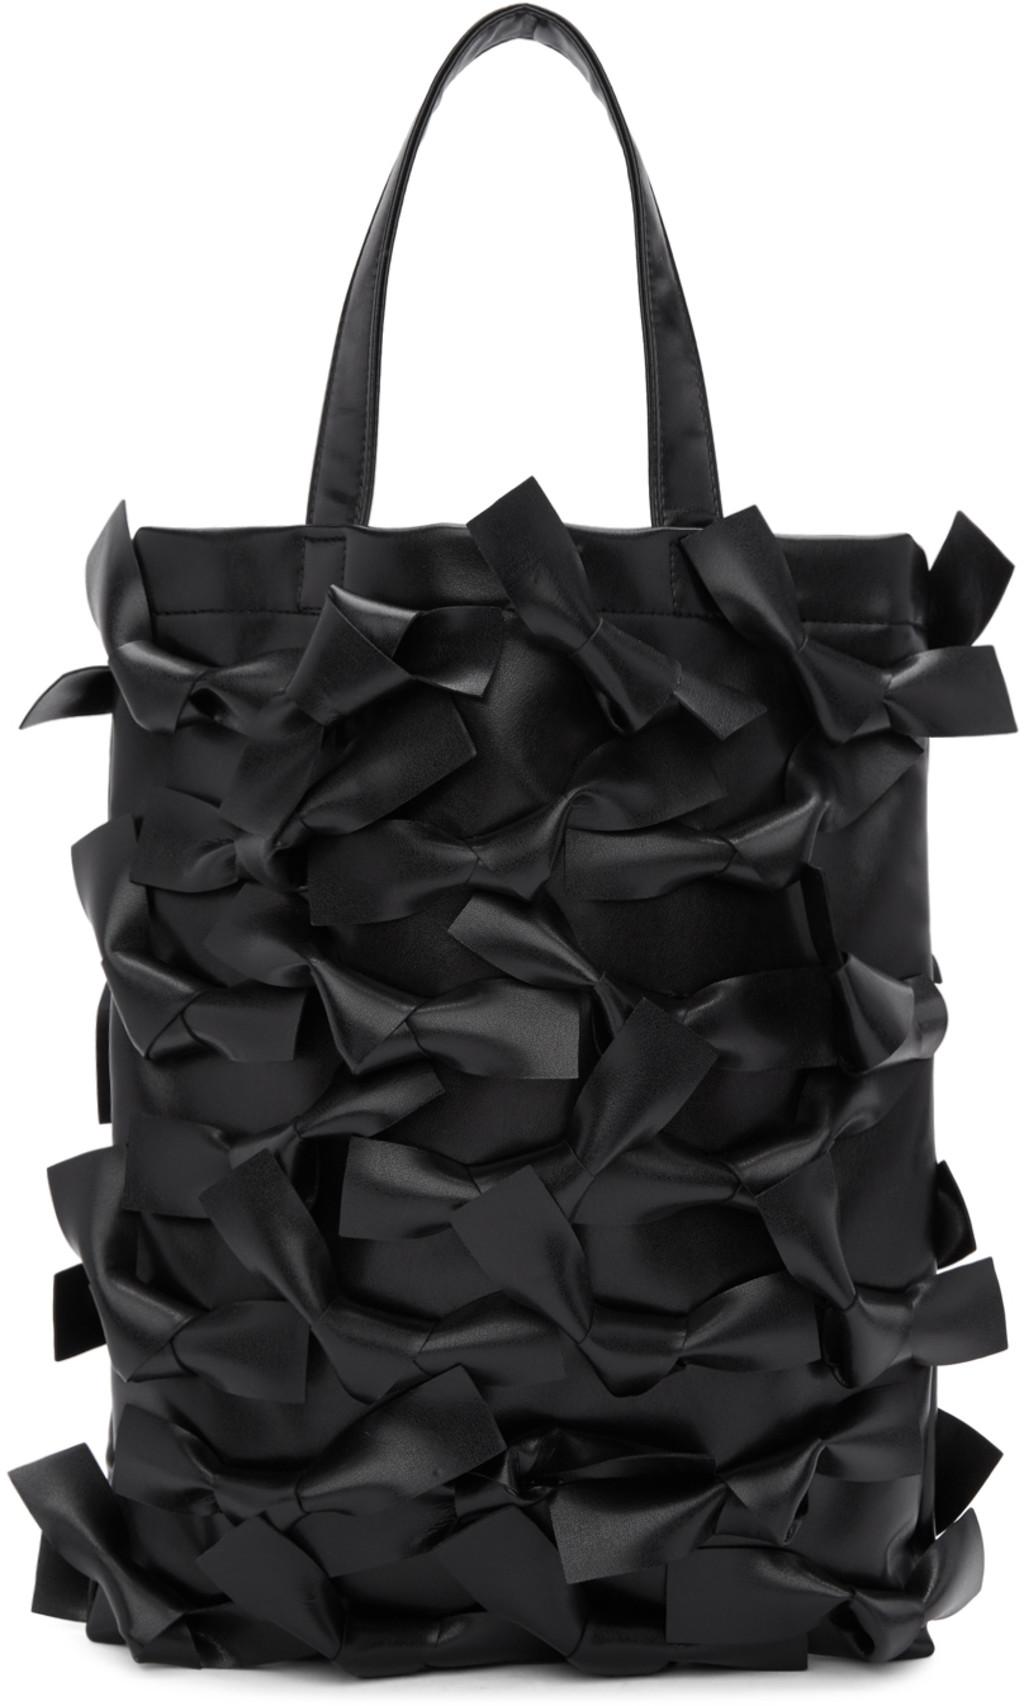 04d01f1d8d5 Chanel Jumbo Xxl Travel Bag | The Shred Centre